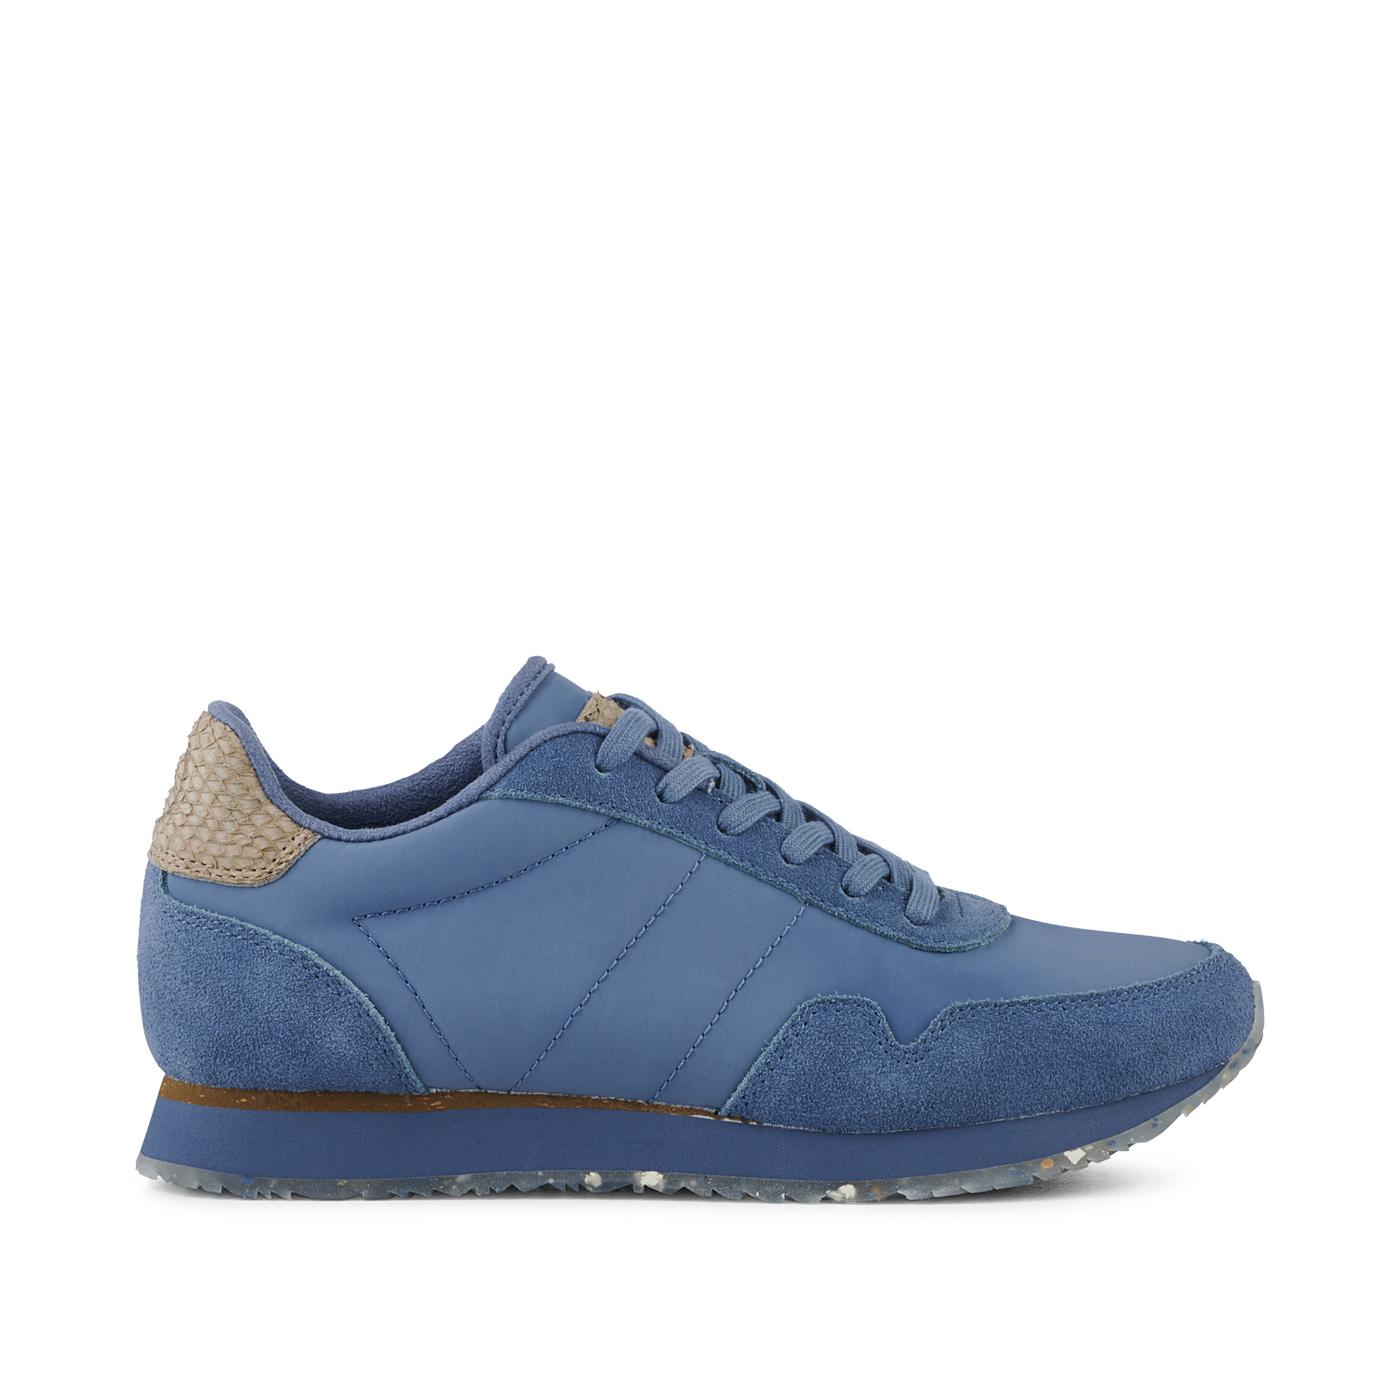 Woden WL166 sneakers 41 773, Vintage blue